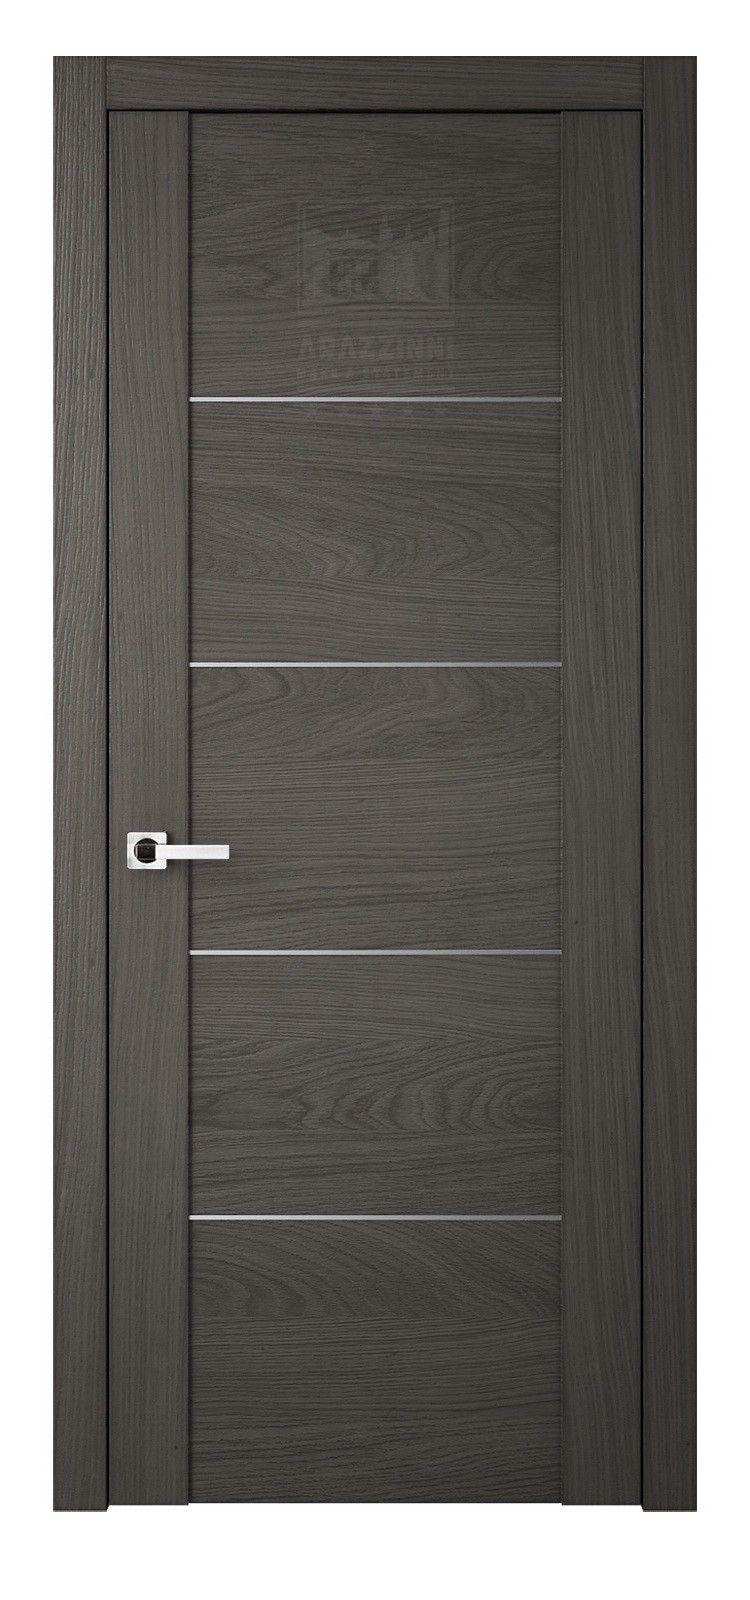 Arazzinni Quadro Q6013 Interior Door Ash Oak Ash Oak Massello Di